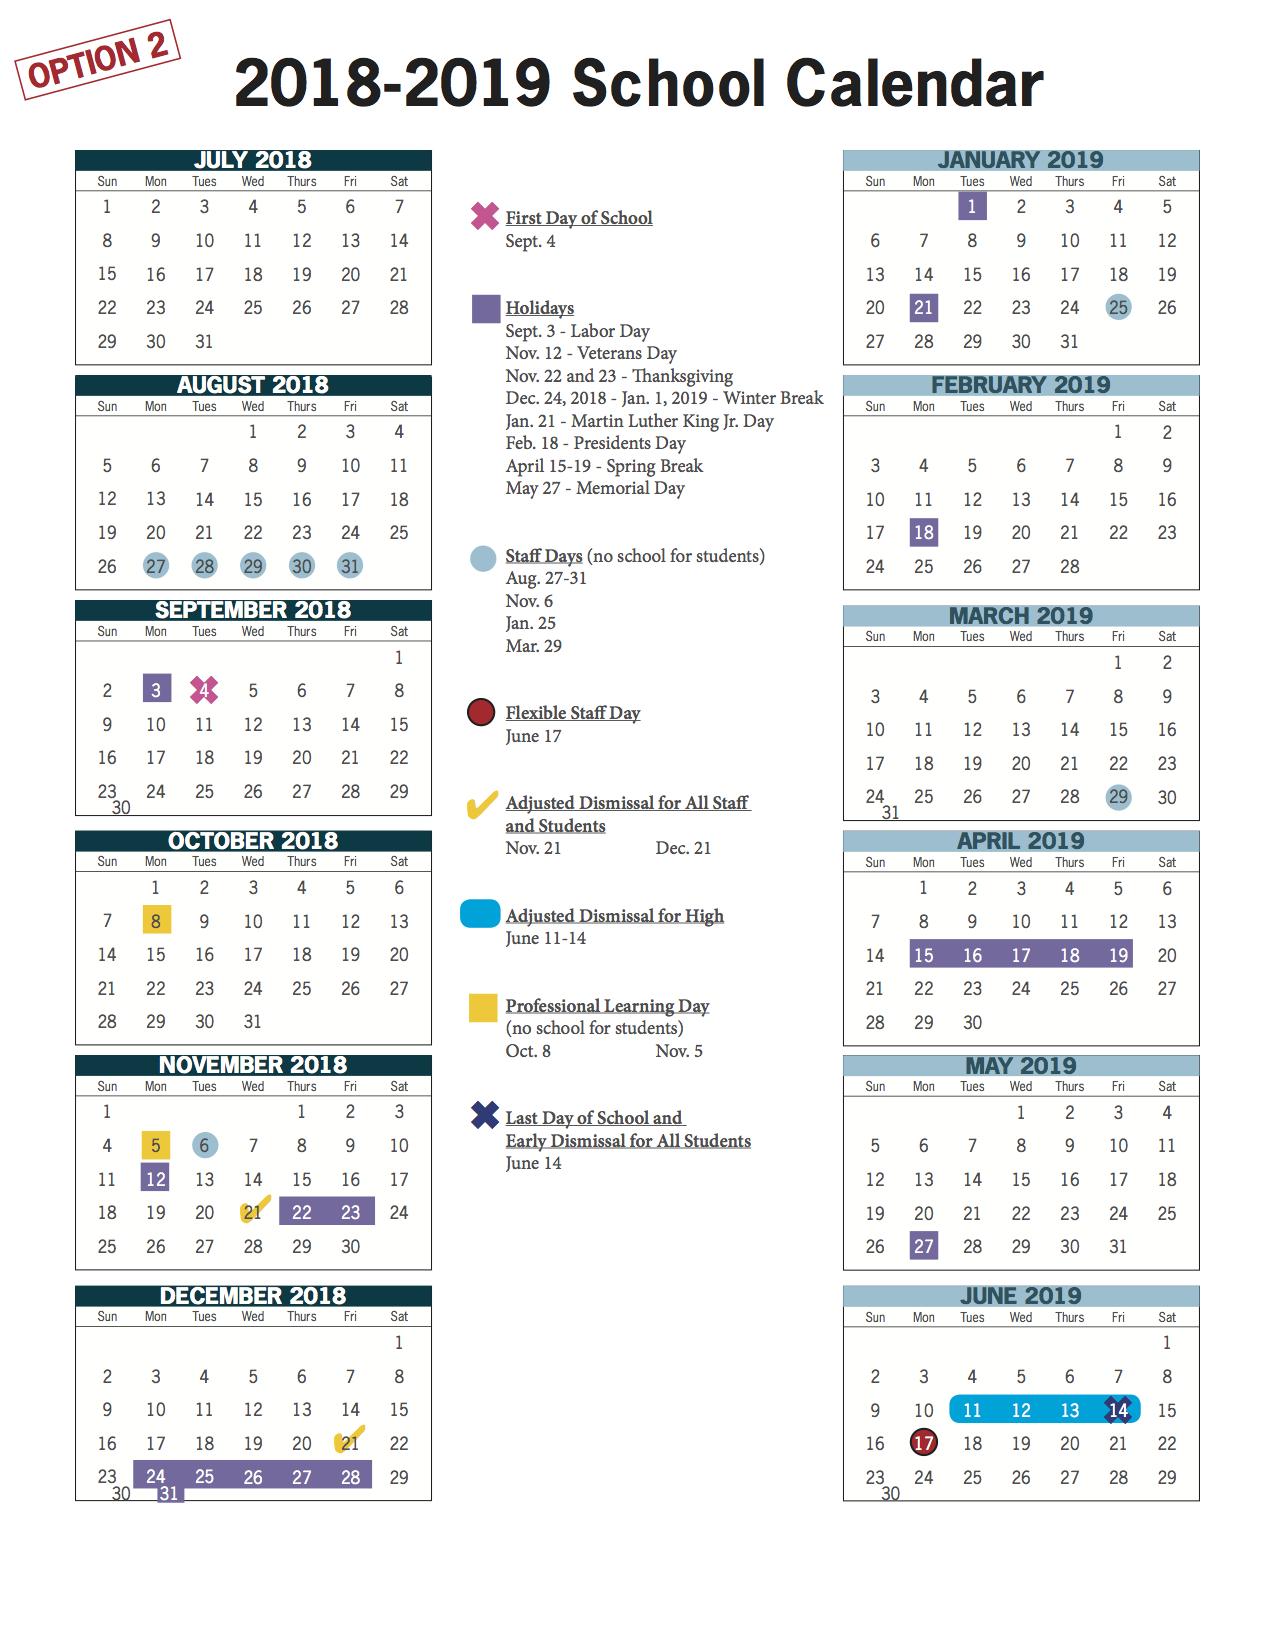 Vbcps E-Town Hall - 2018-2019 And 2019-2020 School Calendar Review regarding Year At A Glance 2019-2020 School Calendar